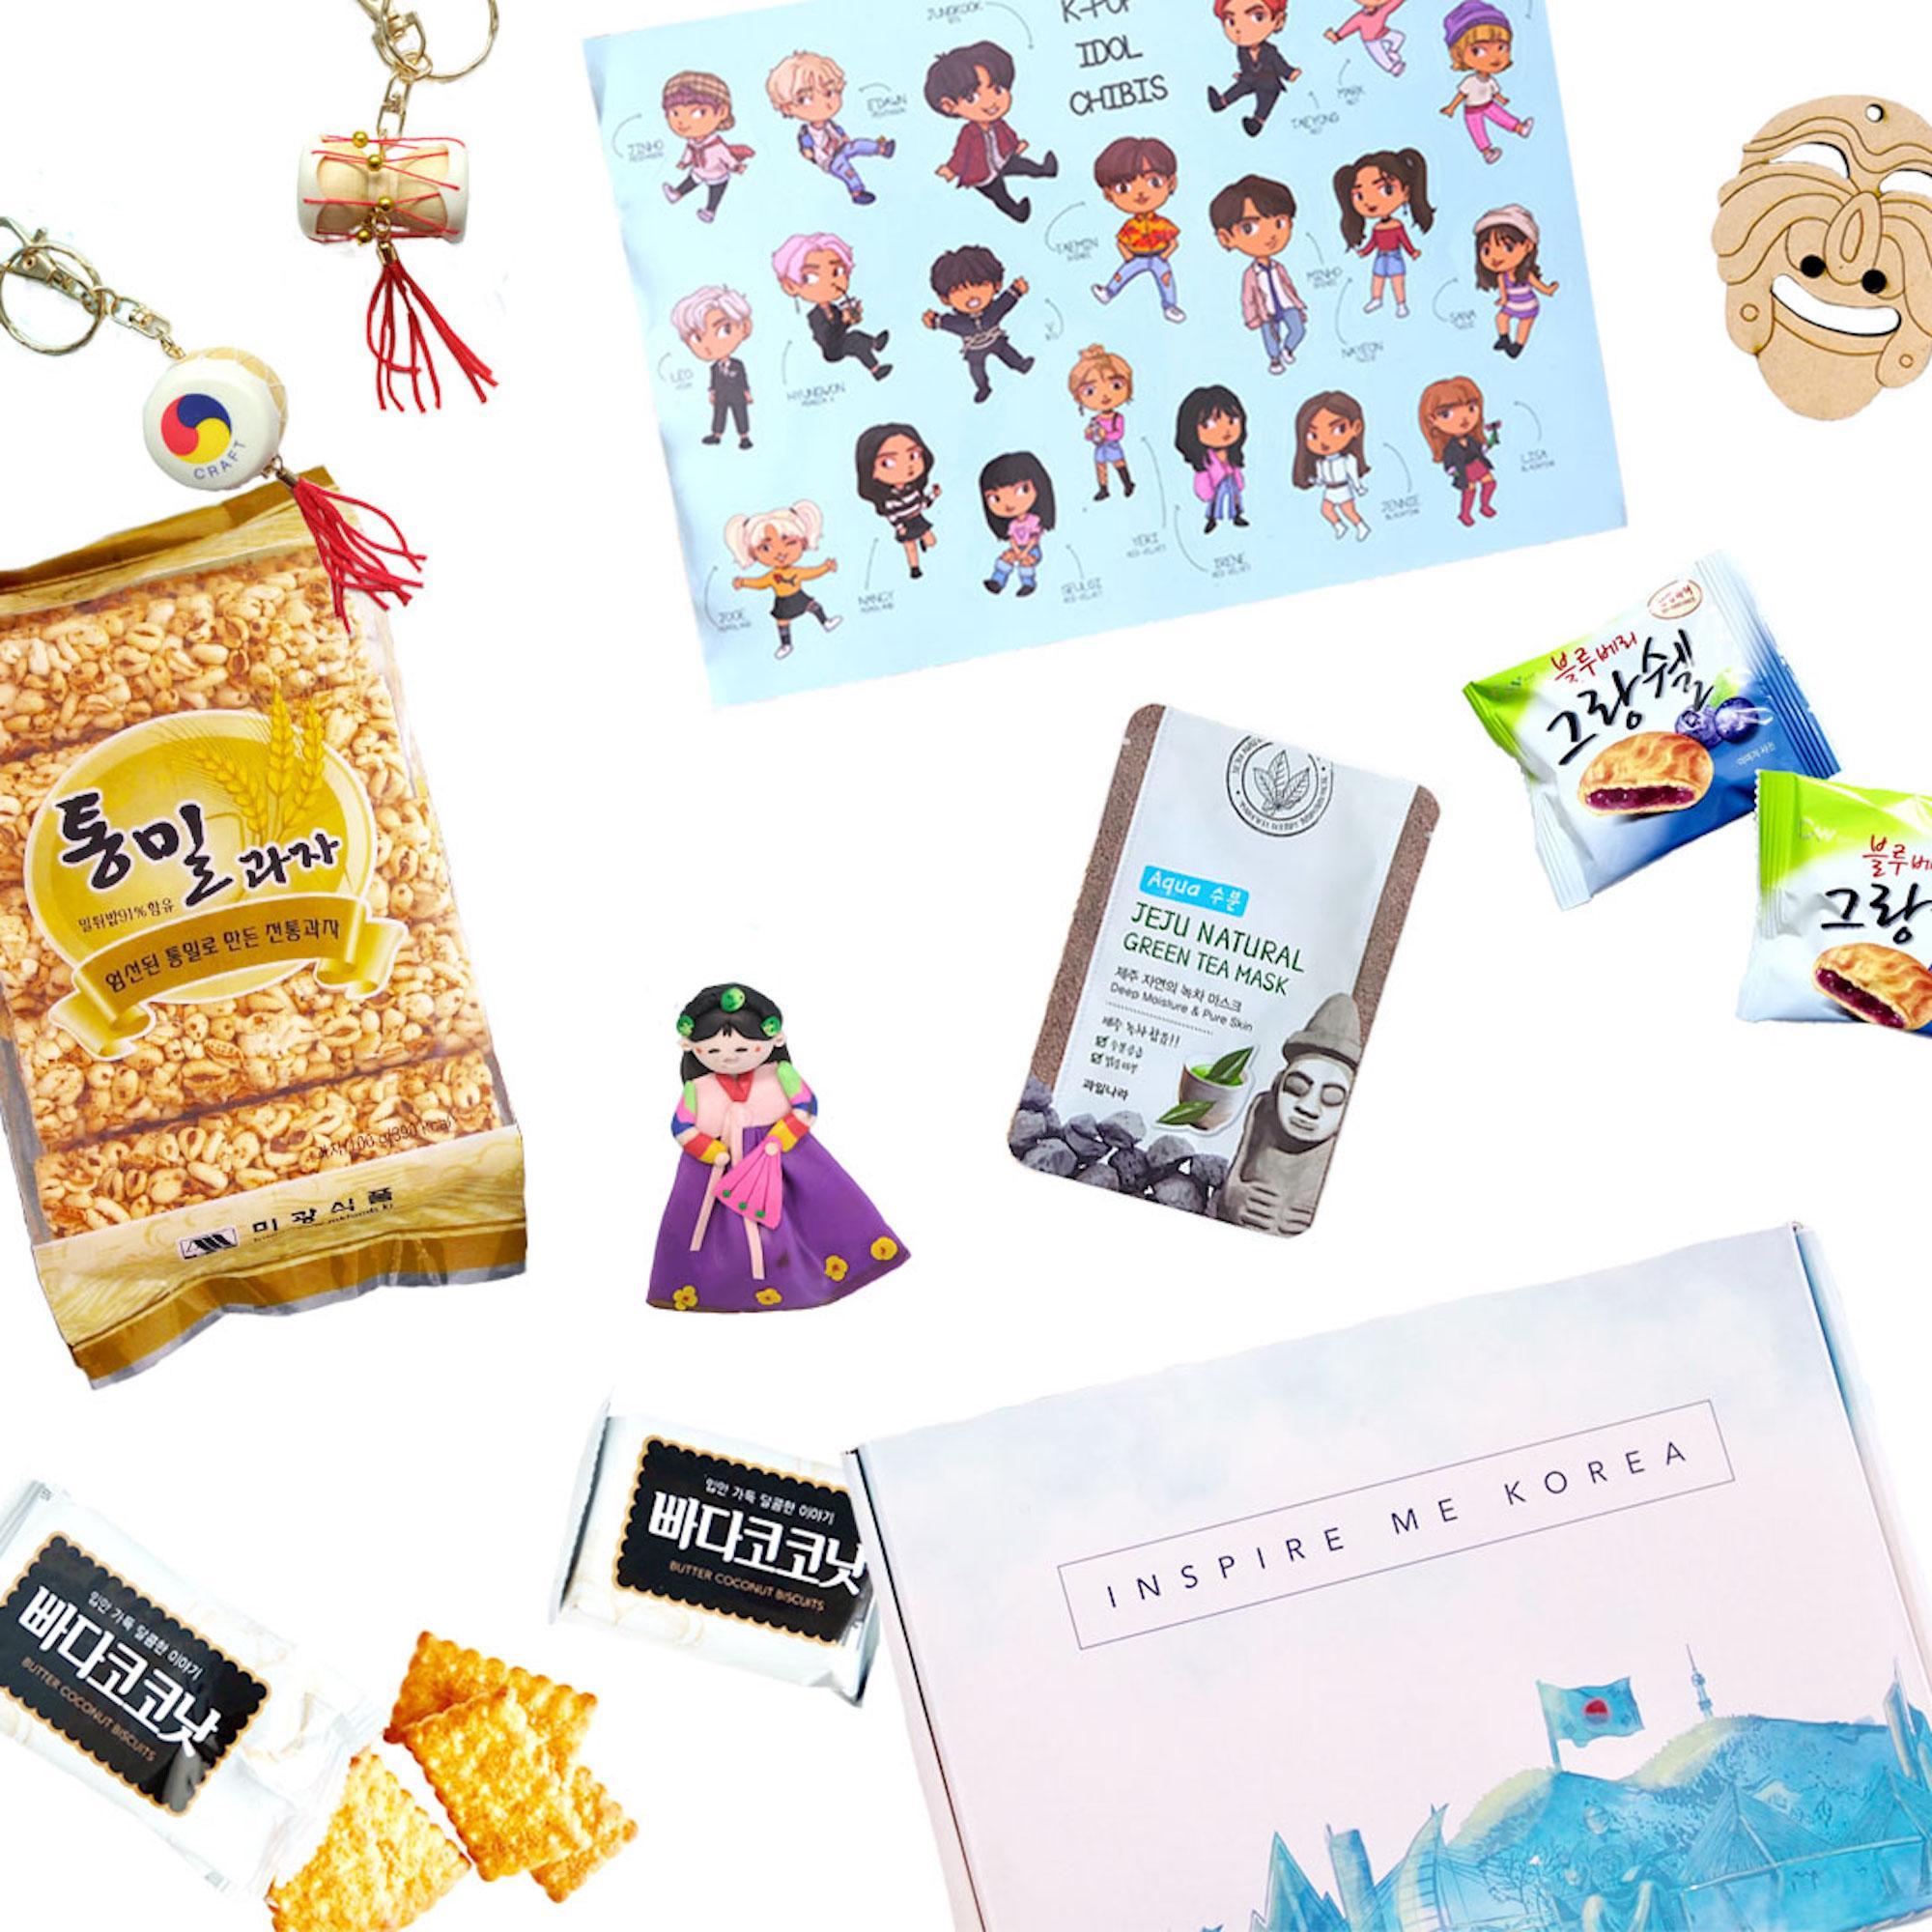 Inspire Me Korea - Korean Culture Subscription Box with Snacks, Beauty, K-Pop Merch, Souvenirs and Magazine: Vegan